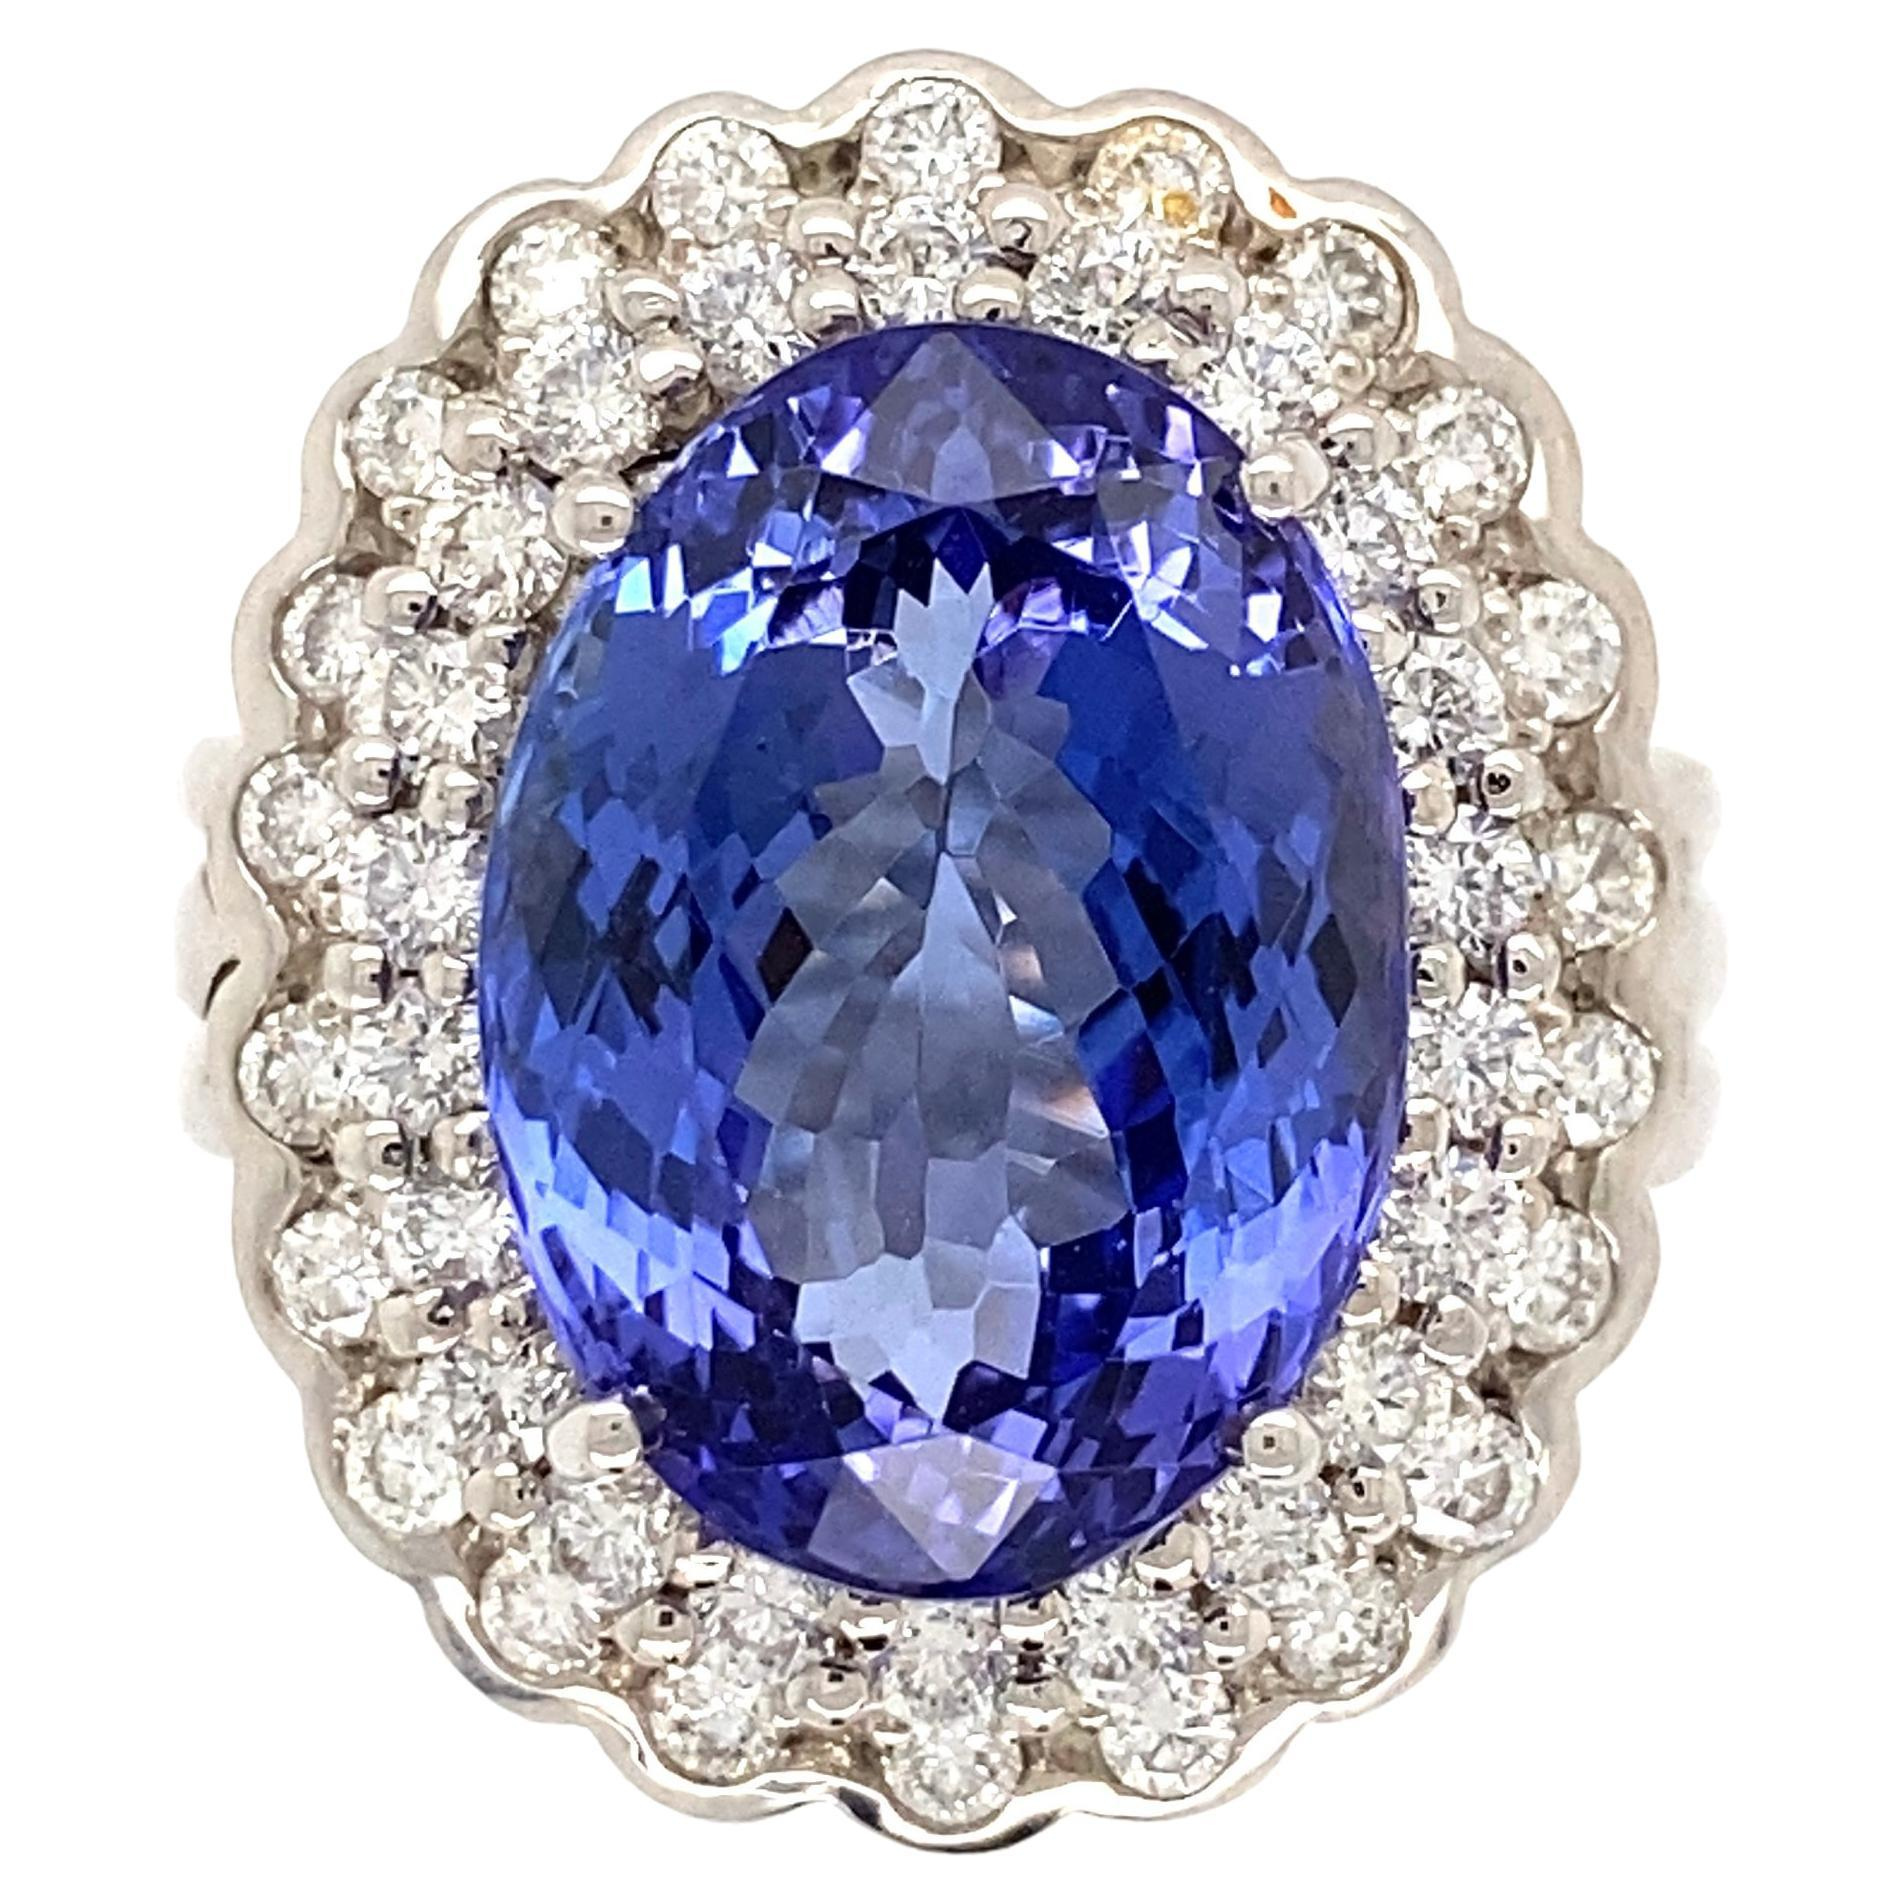 7.59 Carat Tanzanite and Diamond Gold Cocktail Ring Estate Fine Jewelry